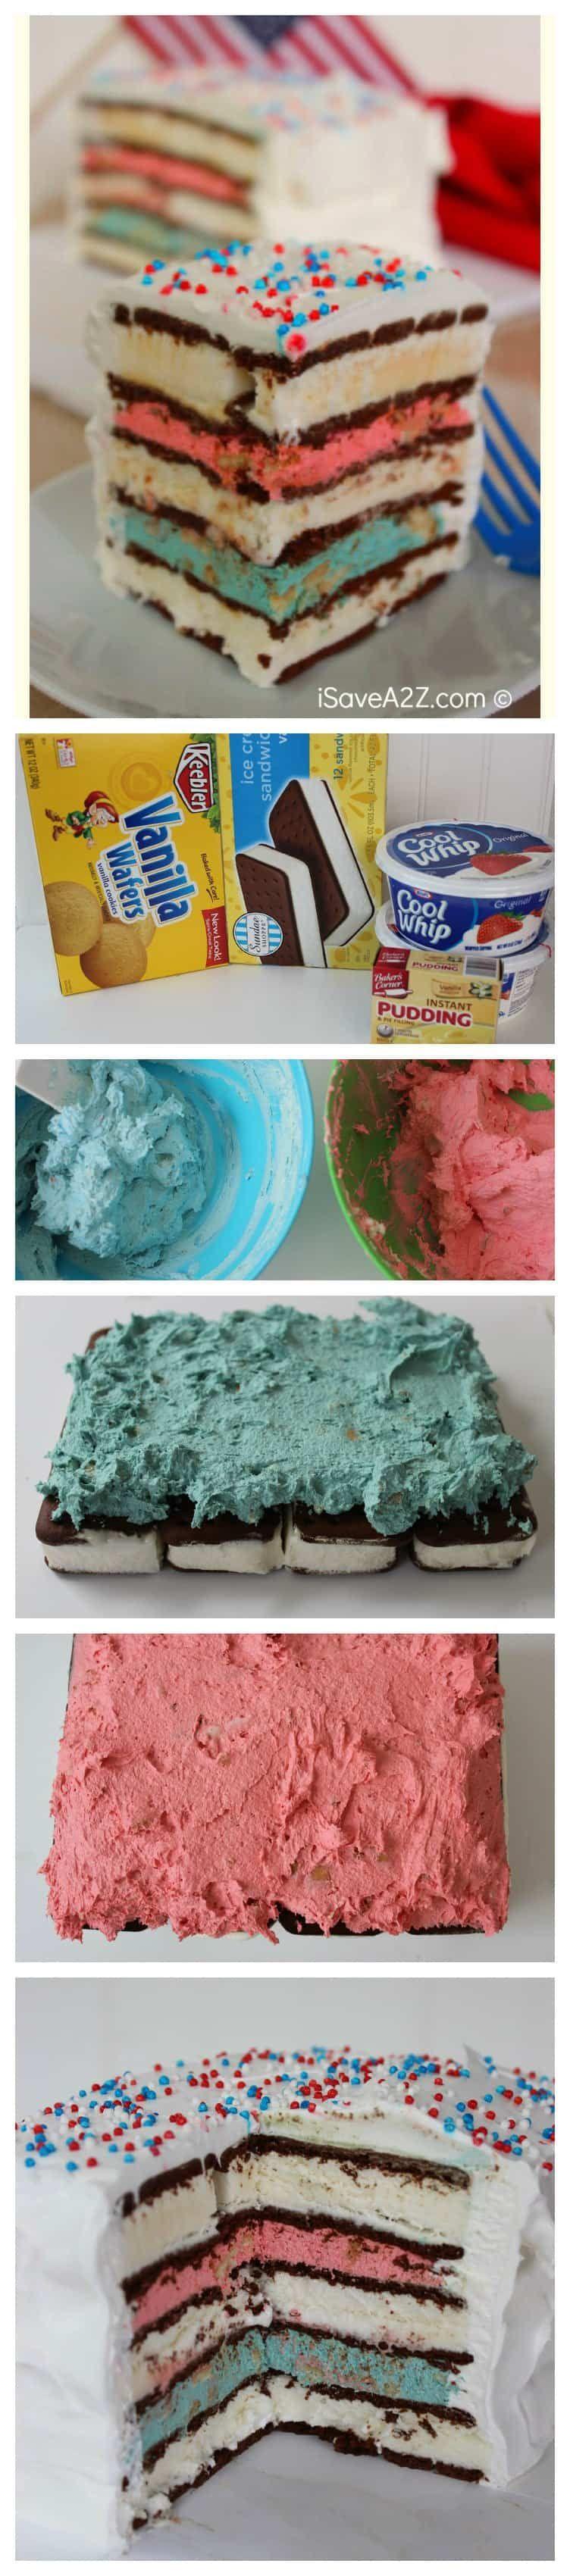 Red White & Blue Ice Cream Sandwich Cake #icecreamsandwich